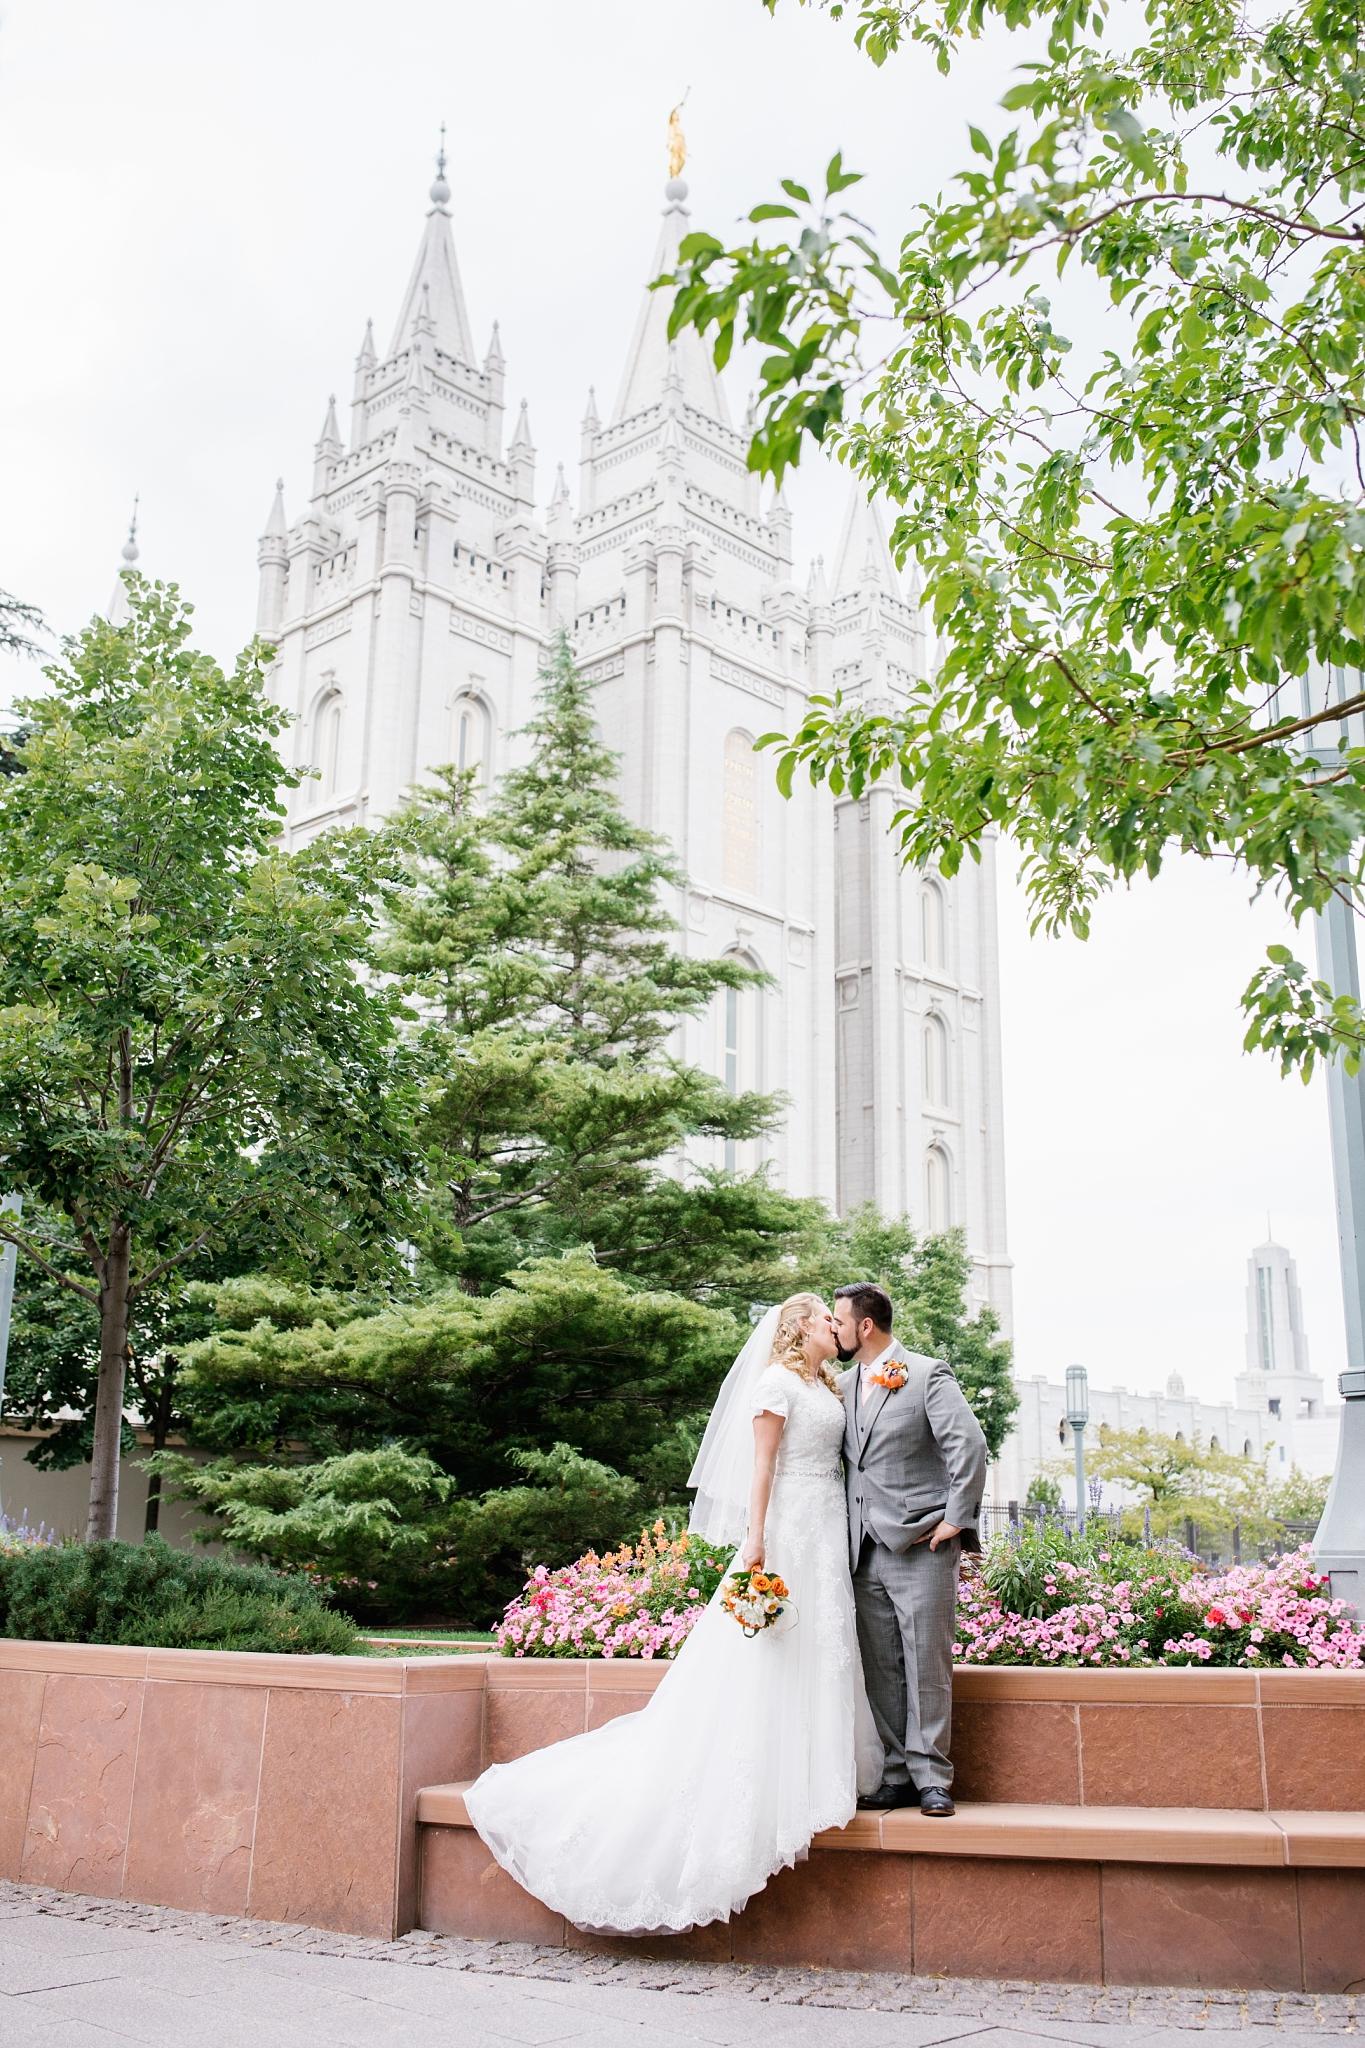 Justin and Melissa-177_Lizzie-B-Imagery-Utah-Wedding-Photographer-Salt-Lake-City-Temple-Photographer-Lion-House-Luncheon-The-Grand-Ballroom-Bountiful.jpg